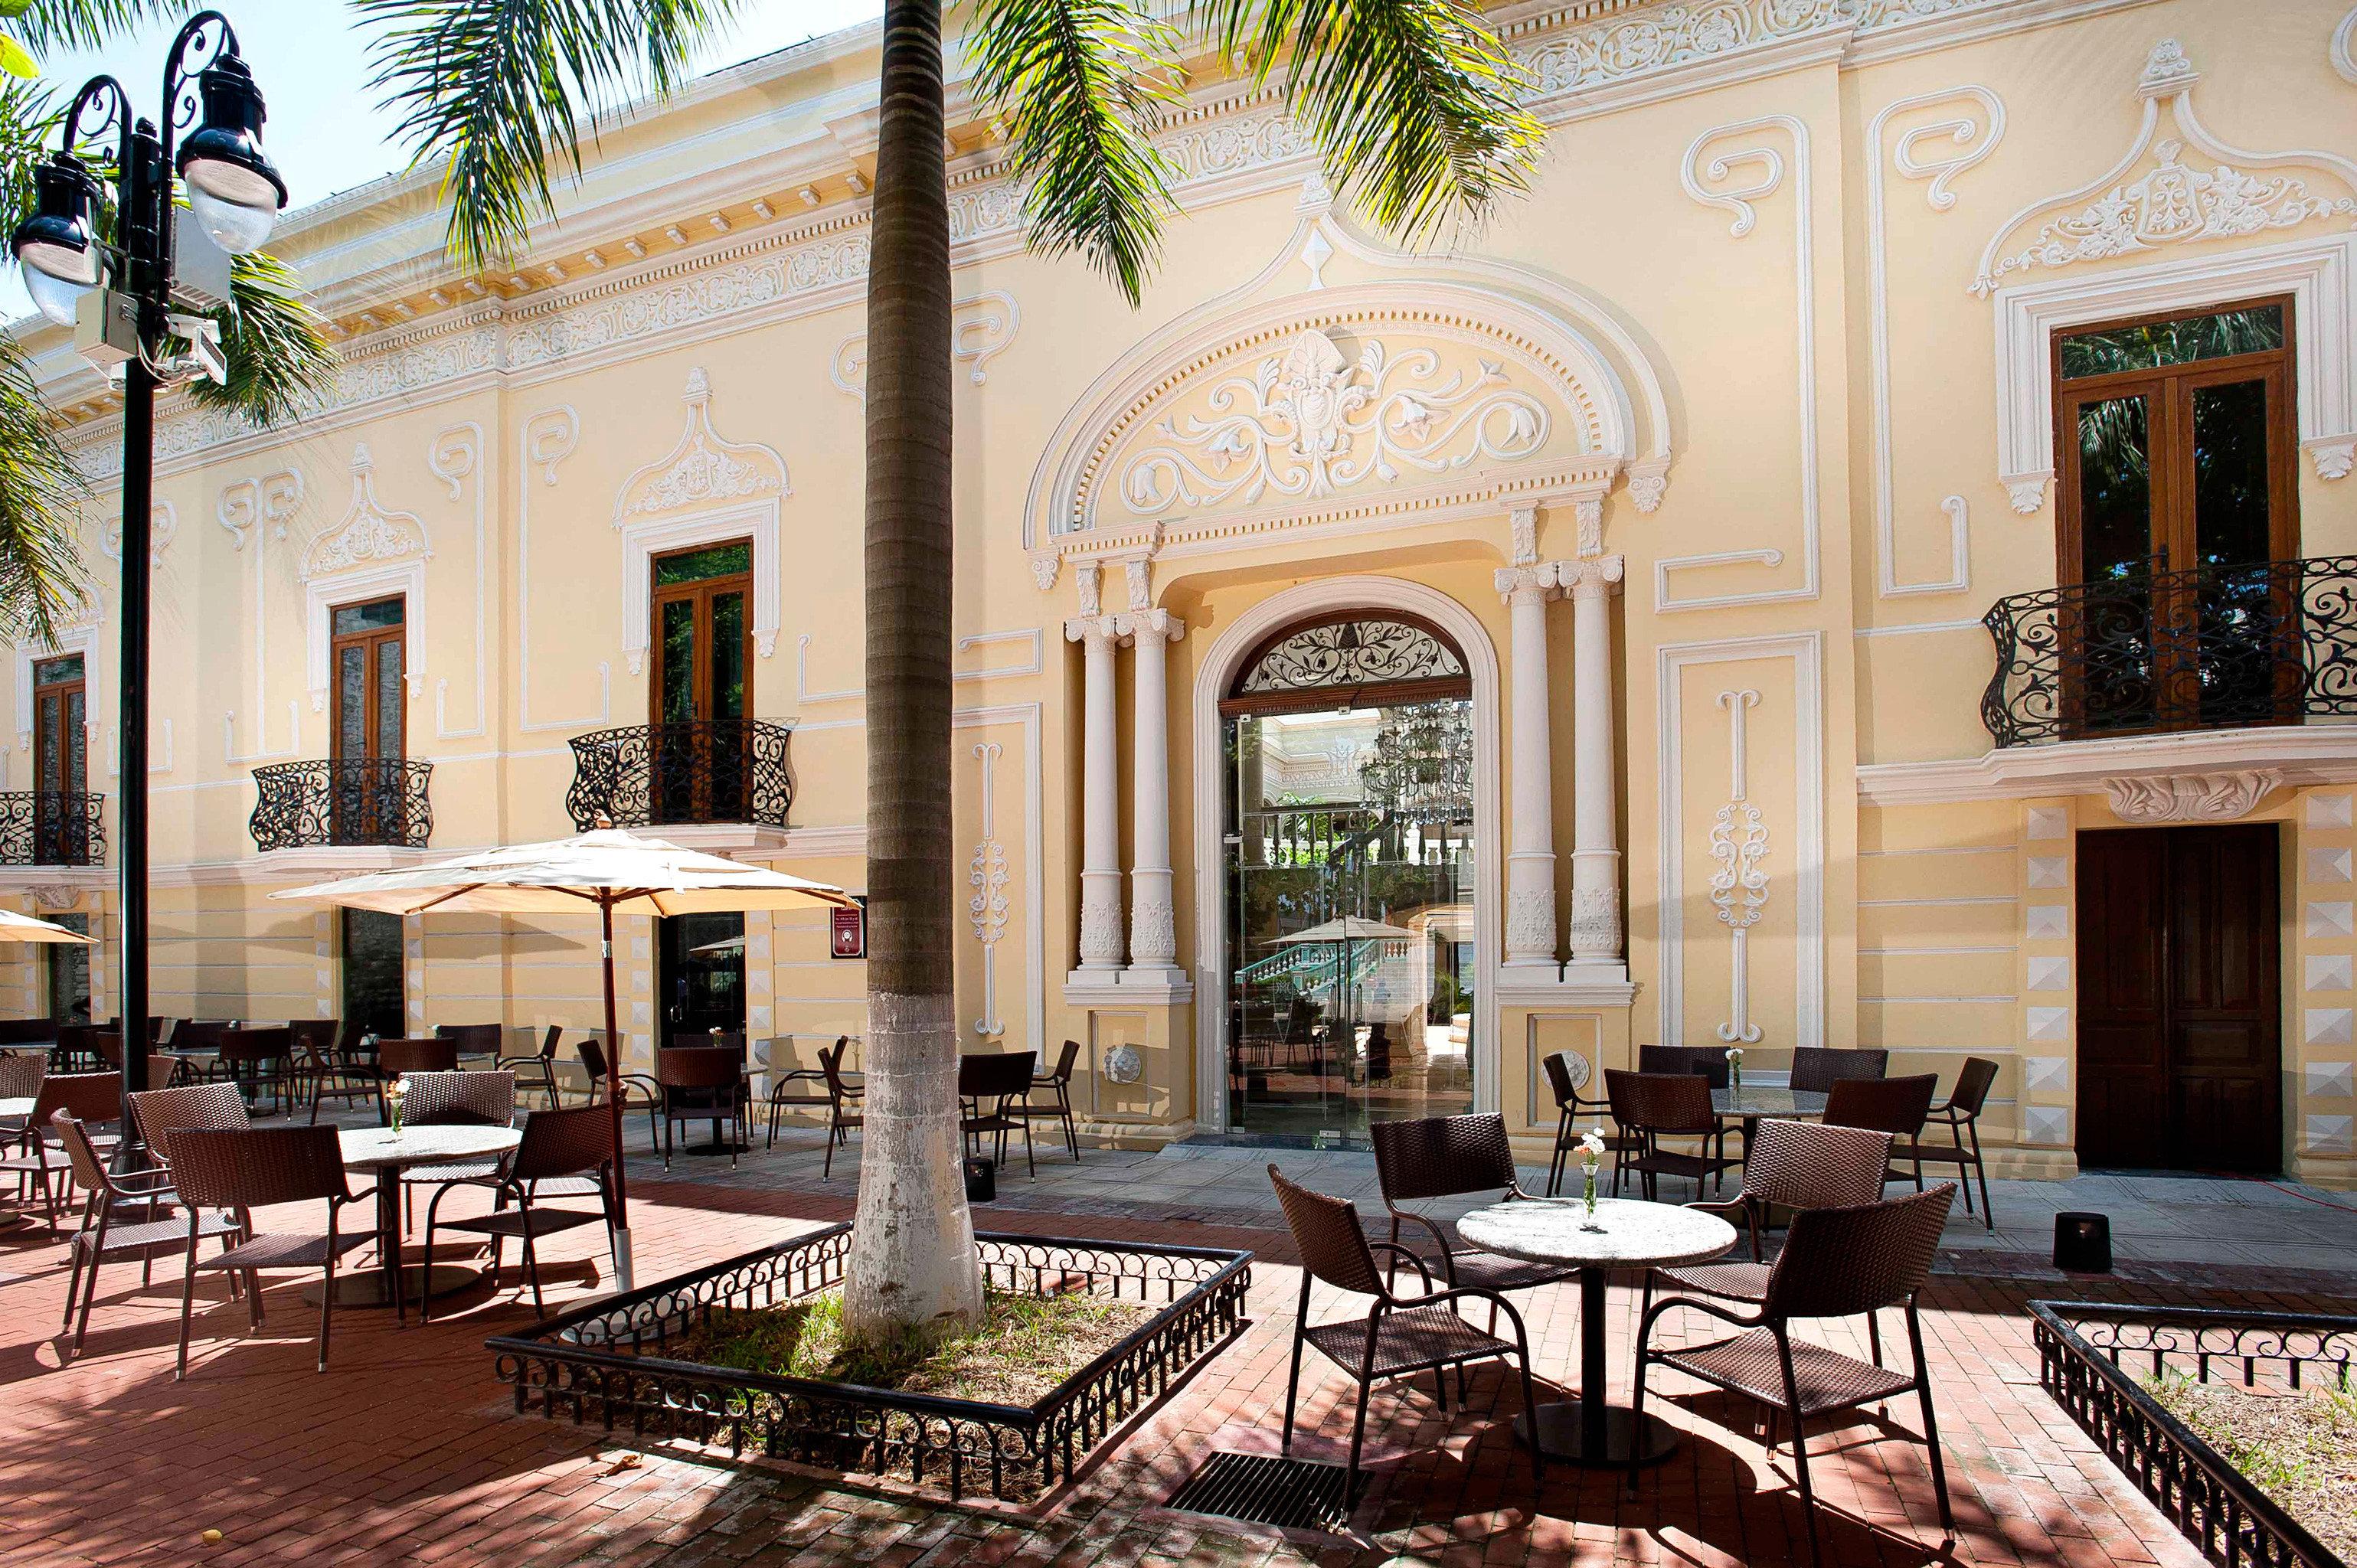 Dining Elegant Patio property chair Lobby building Courtyard home mansion palace condominium Villa plaza hacienda living room